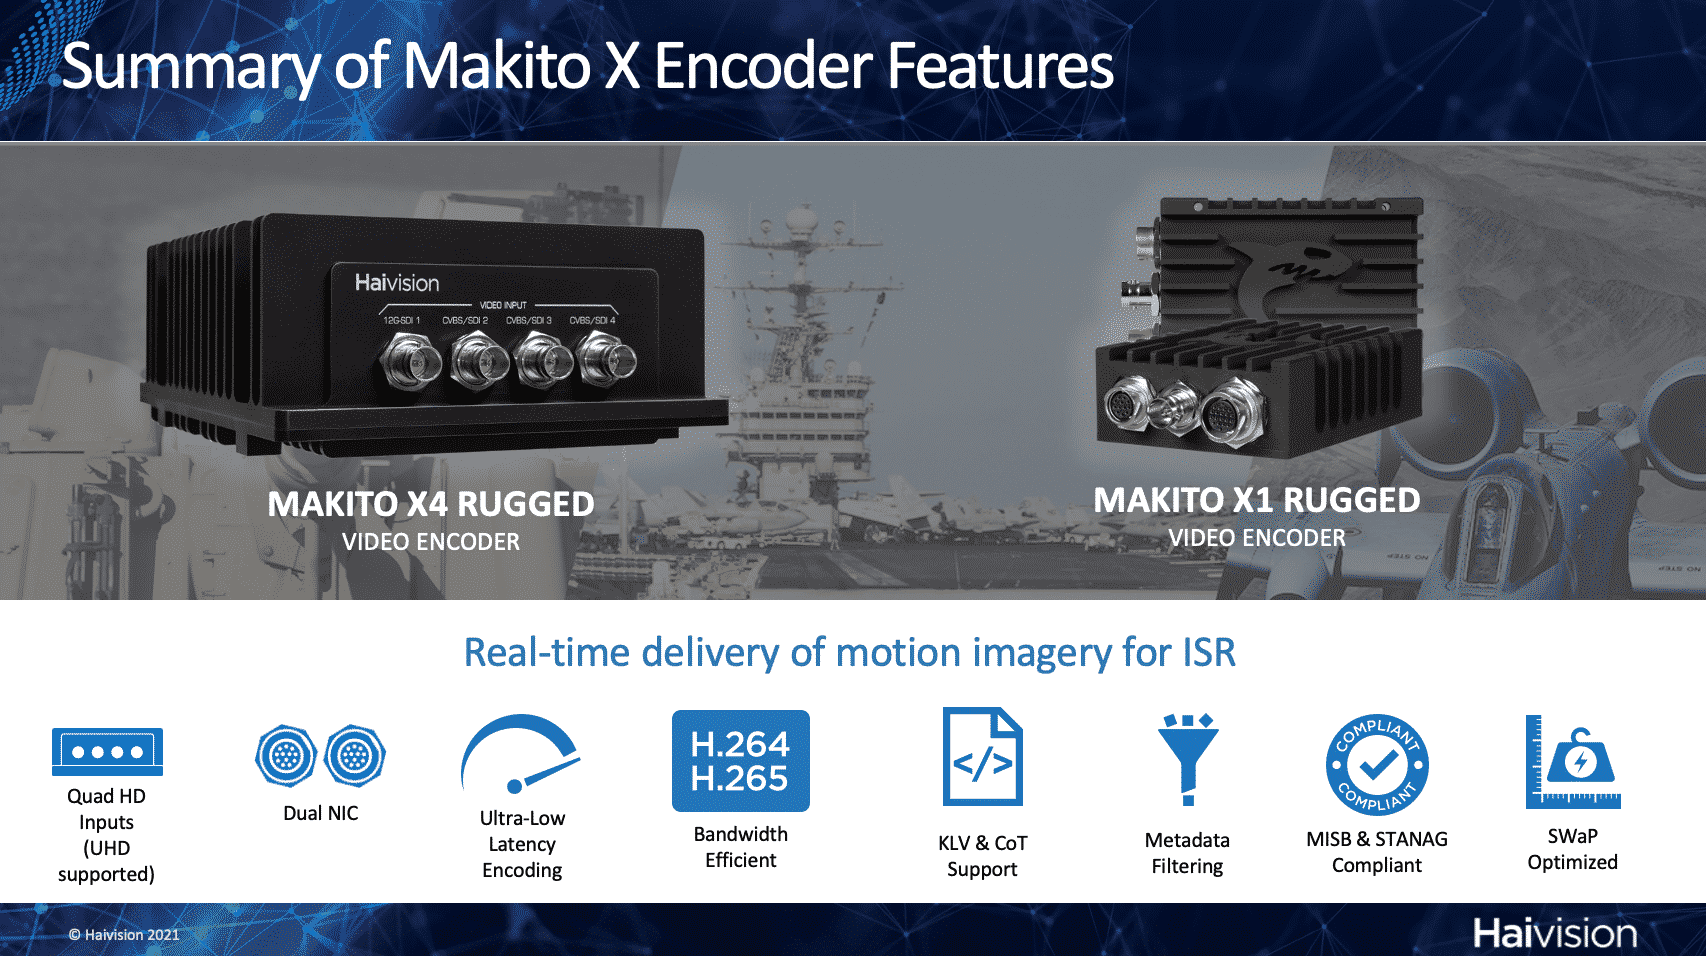 Makito X Encoder Features